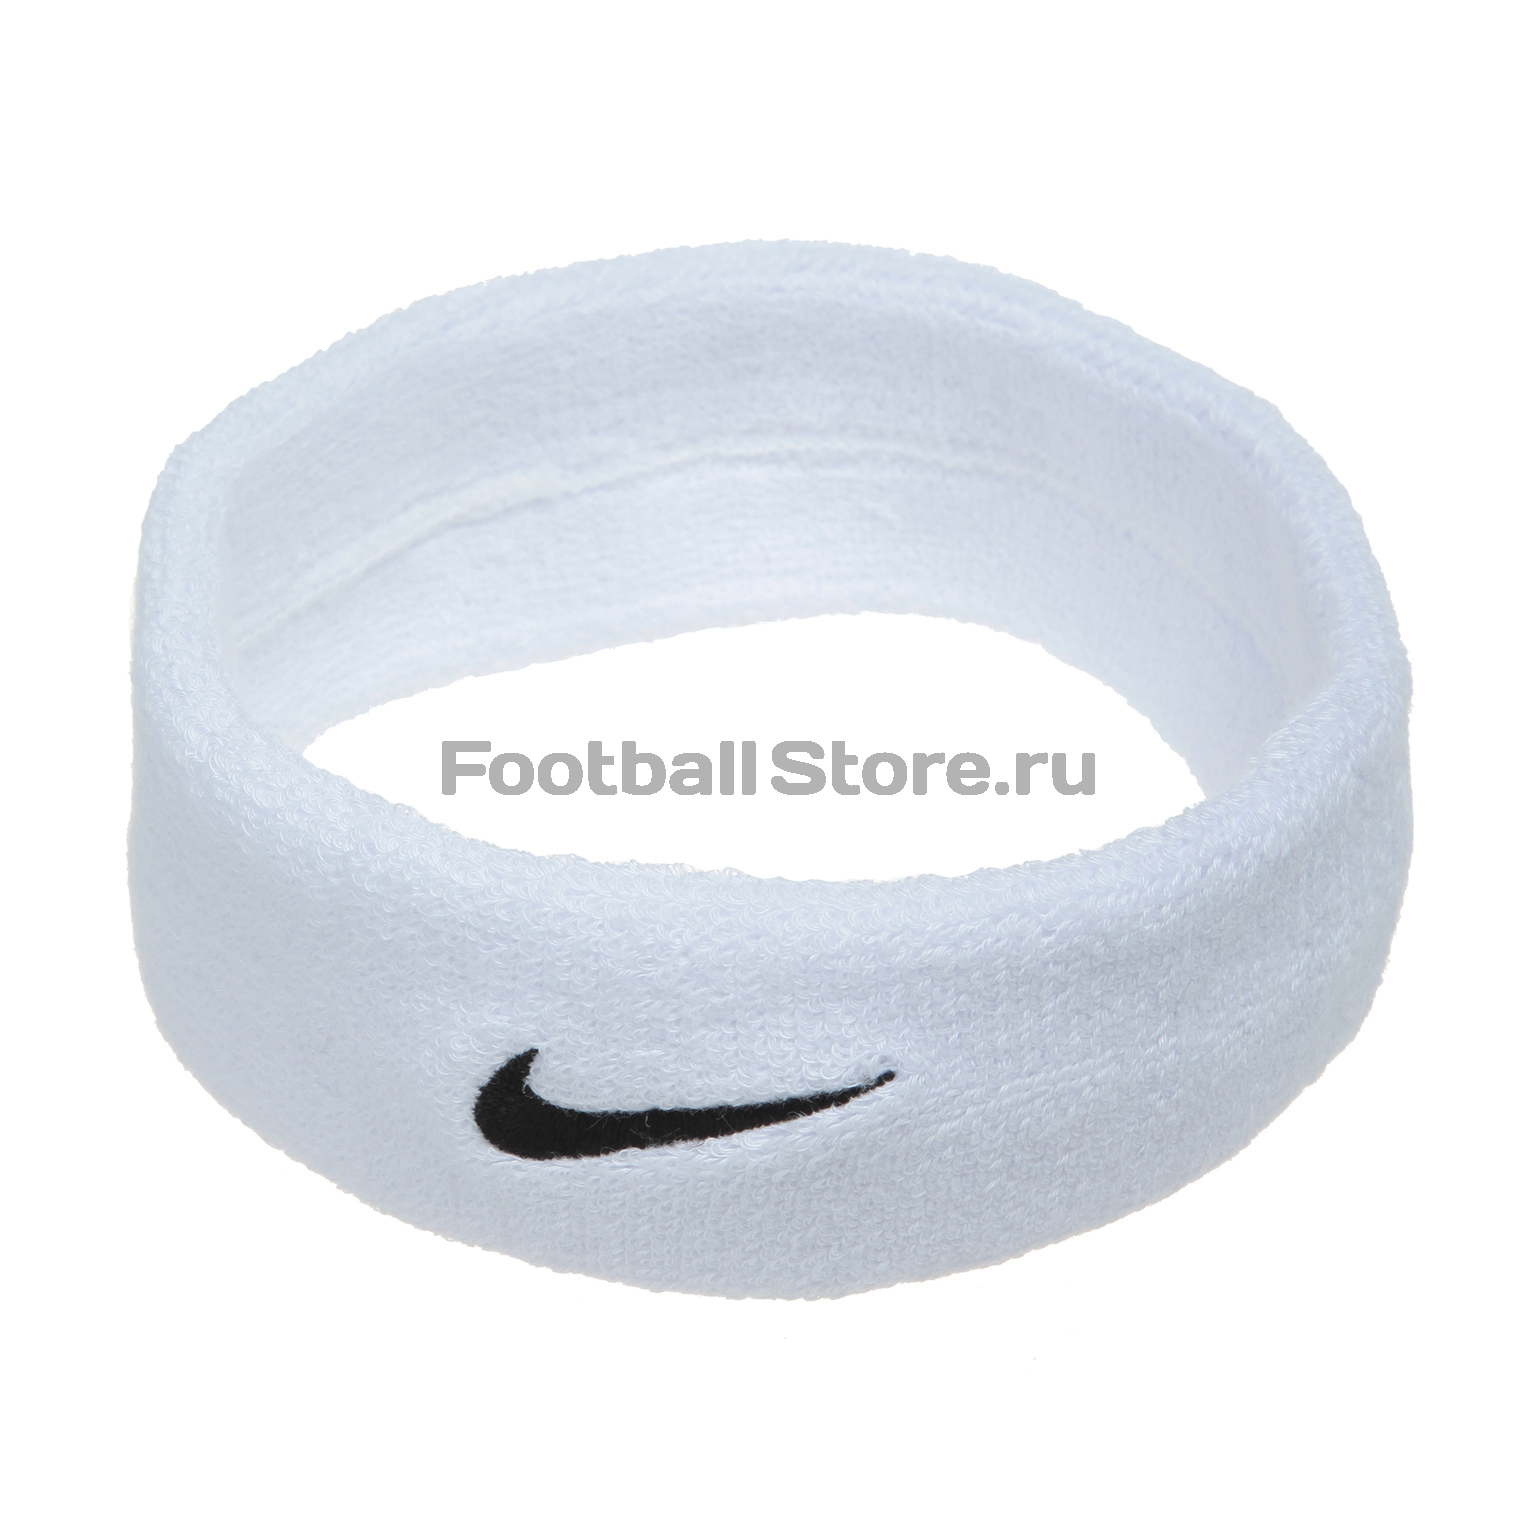 Повязки Nike Повязка на голову Nike Swoosh Headband N.NN.07.101.OS многофункциональная повязка на голову